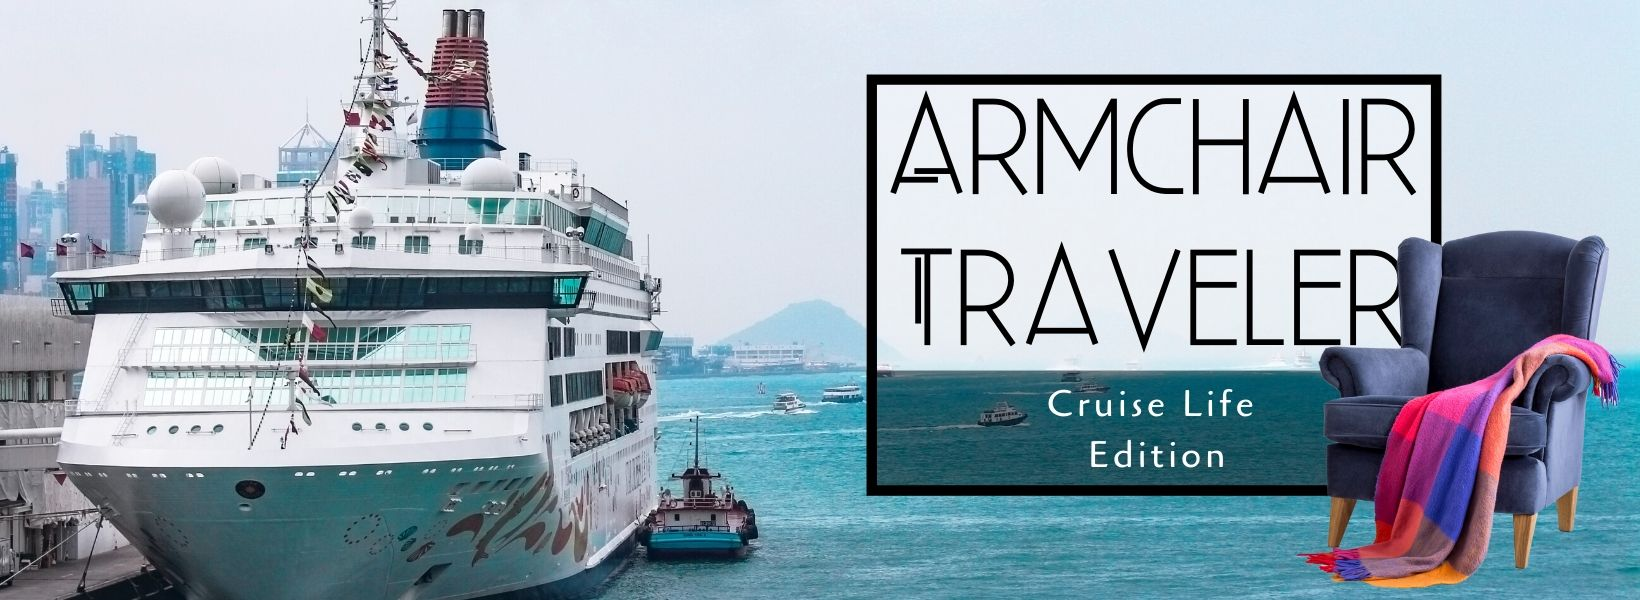 The Armchair Traveler – Cruise Life